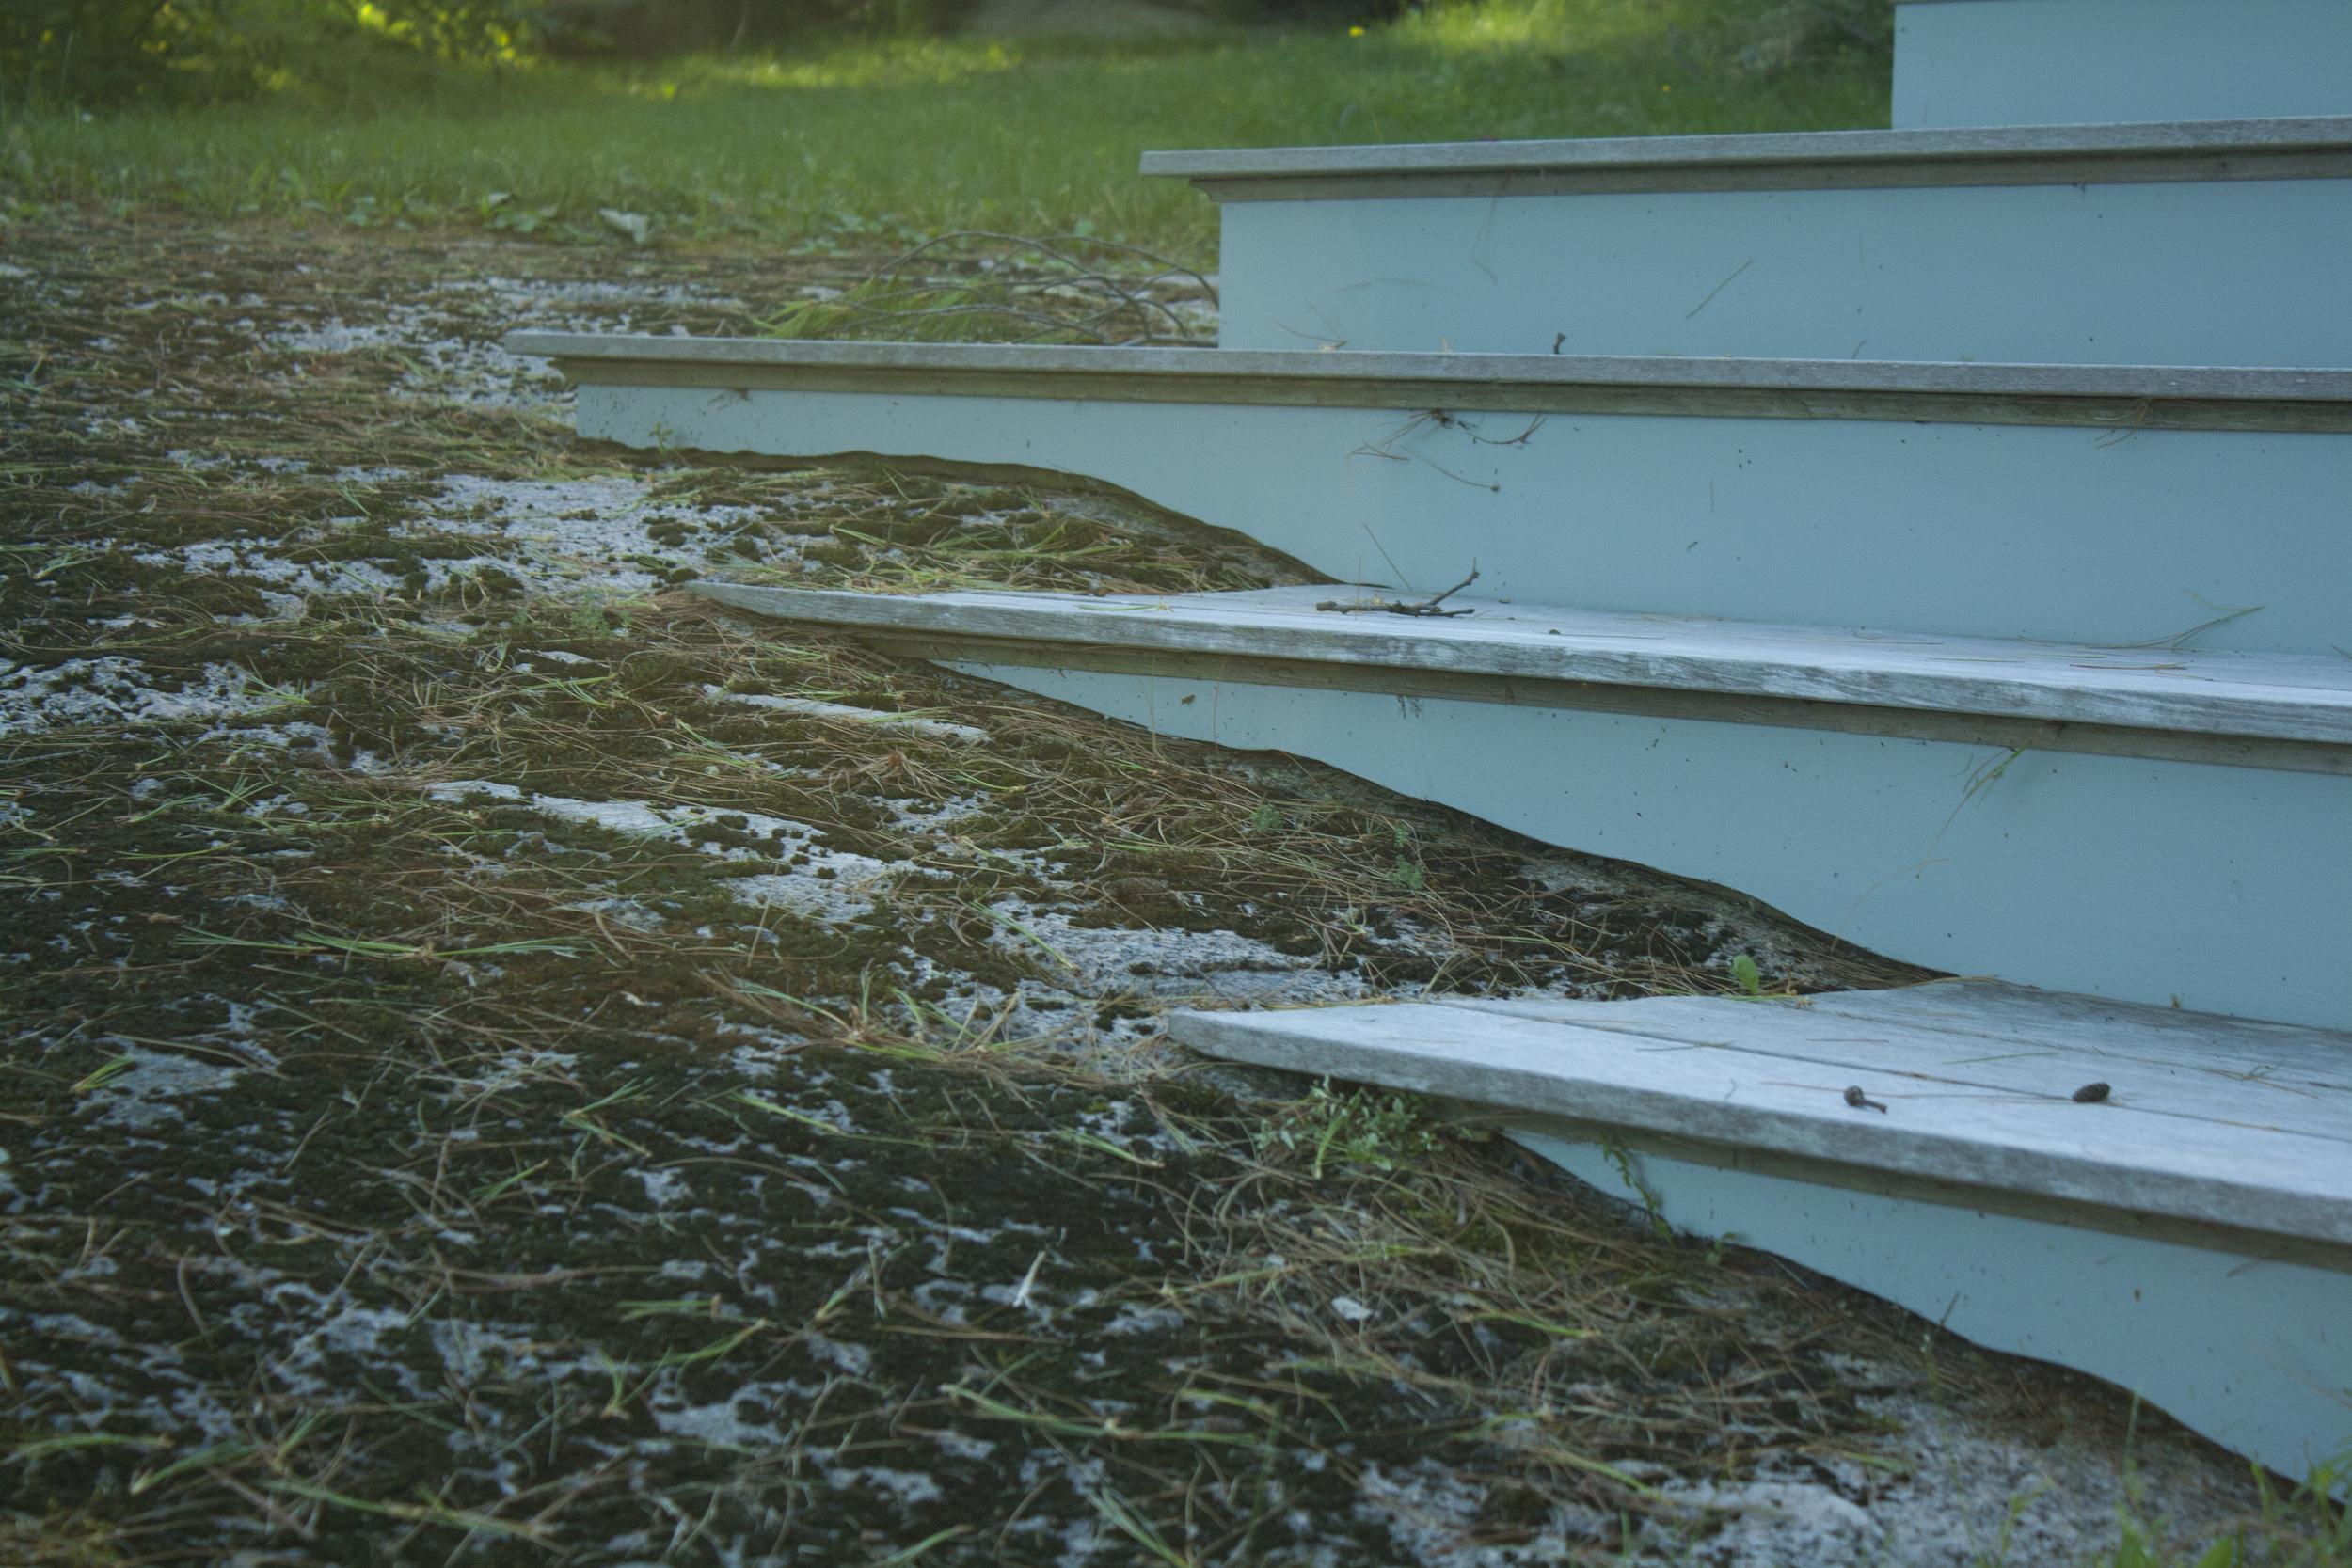 Thousand Islands Cottage | Stair Design | Landscape Architecture | Brockville | Riverview Design Solutions | Prescott, Ontario, Canada